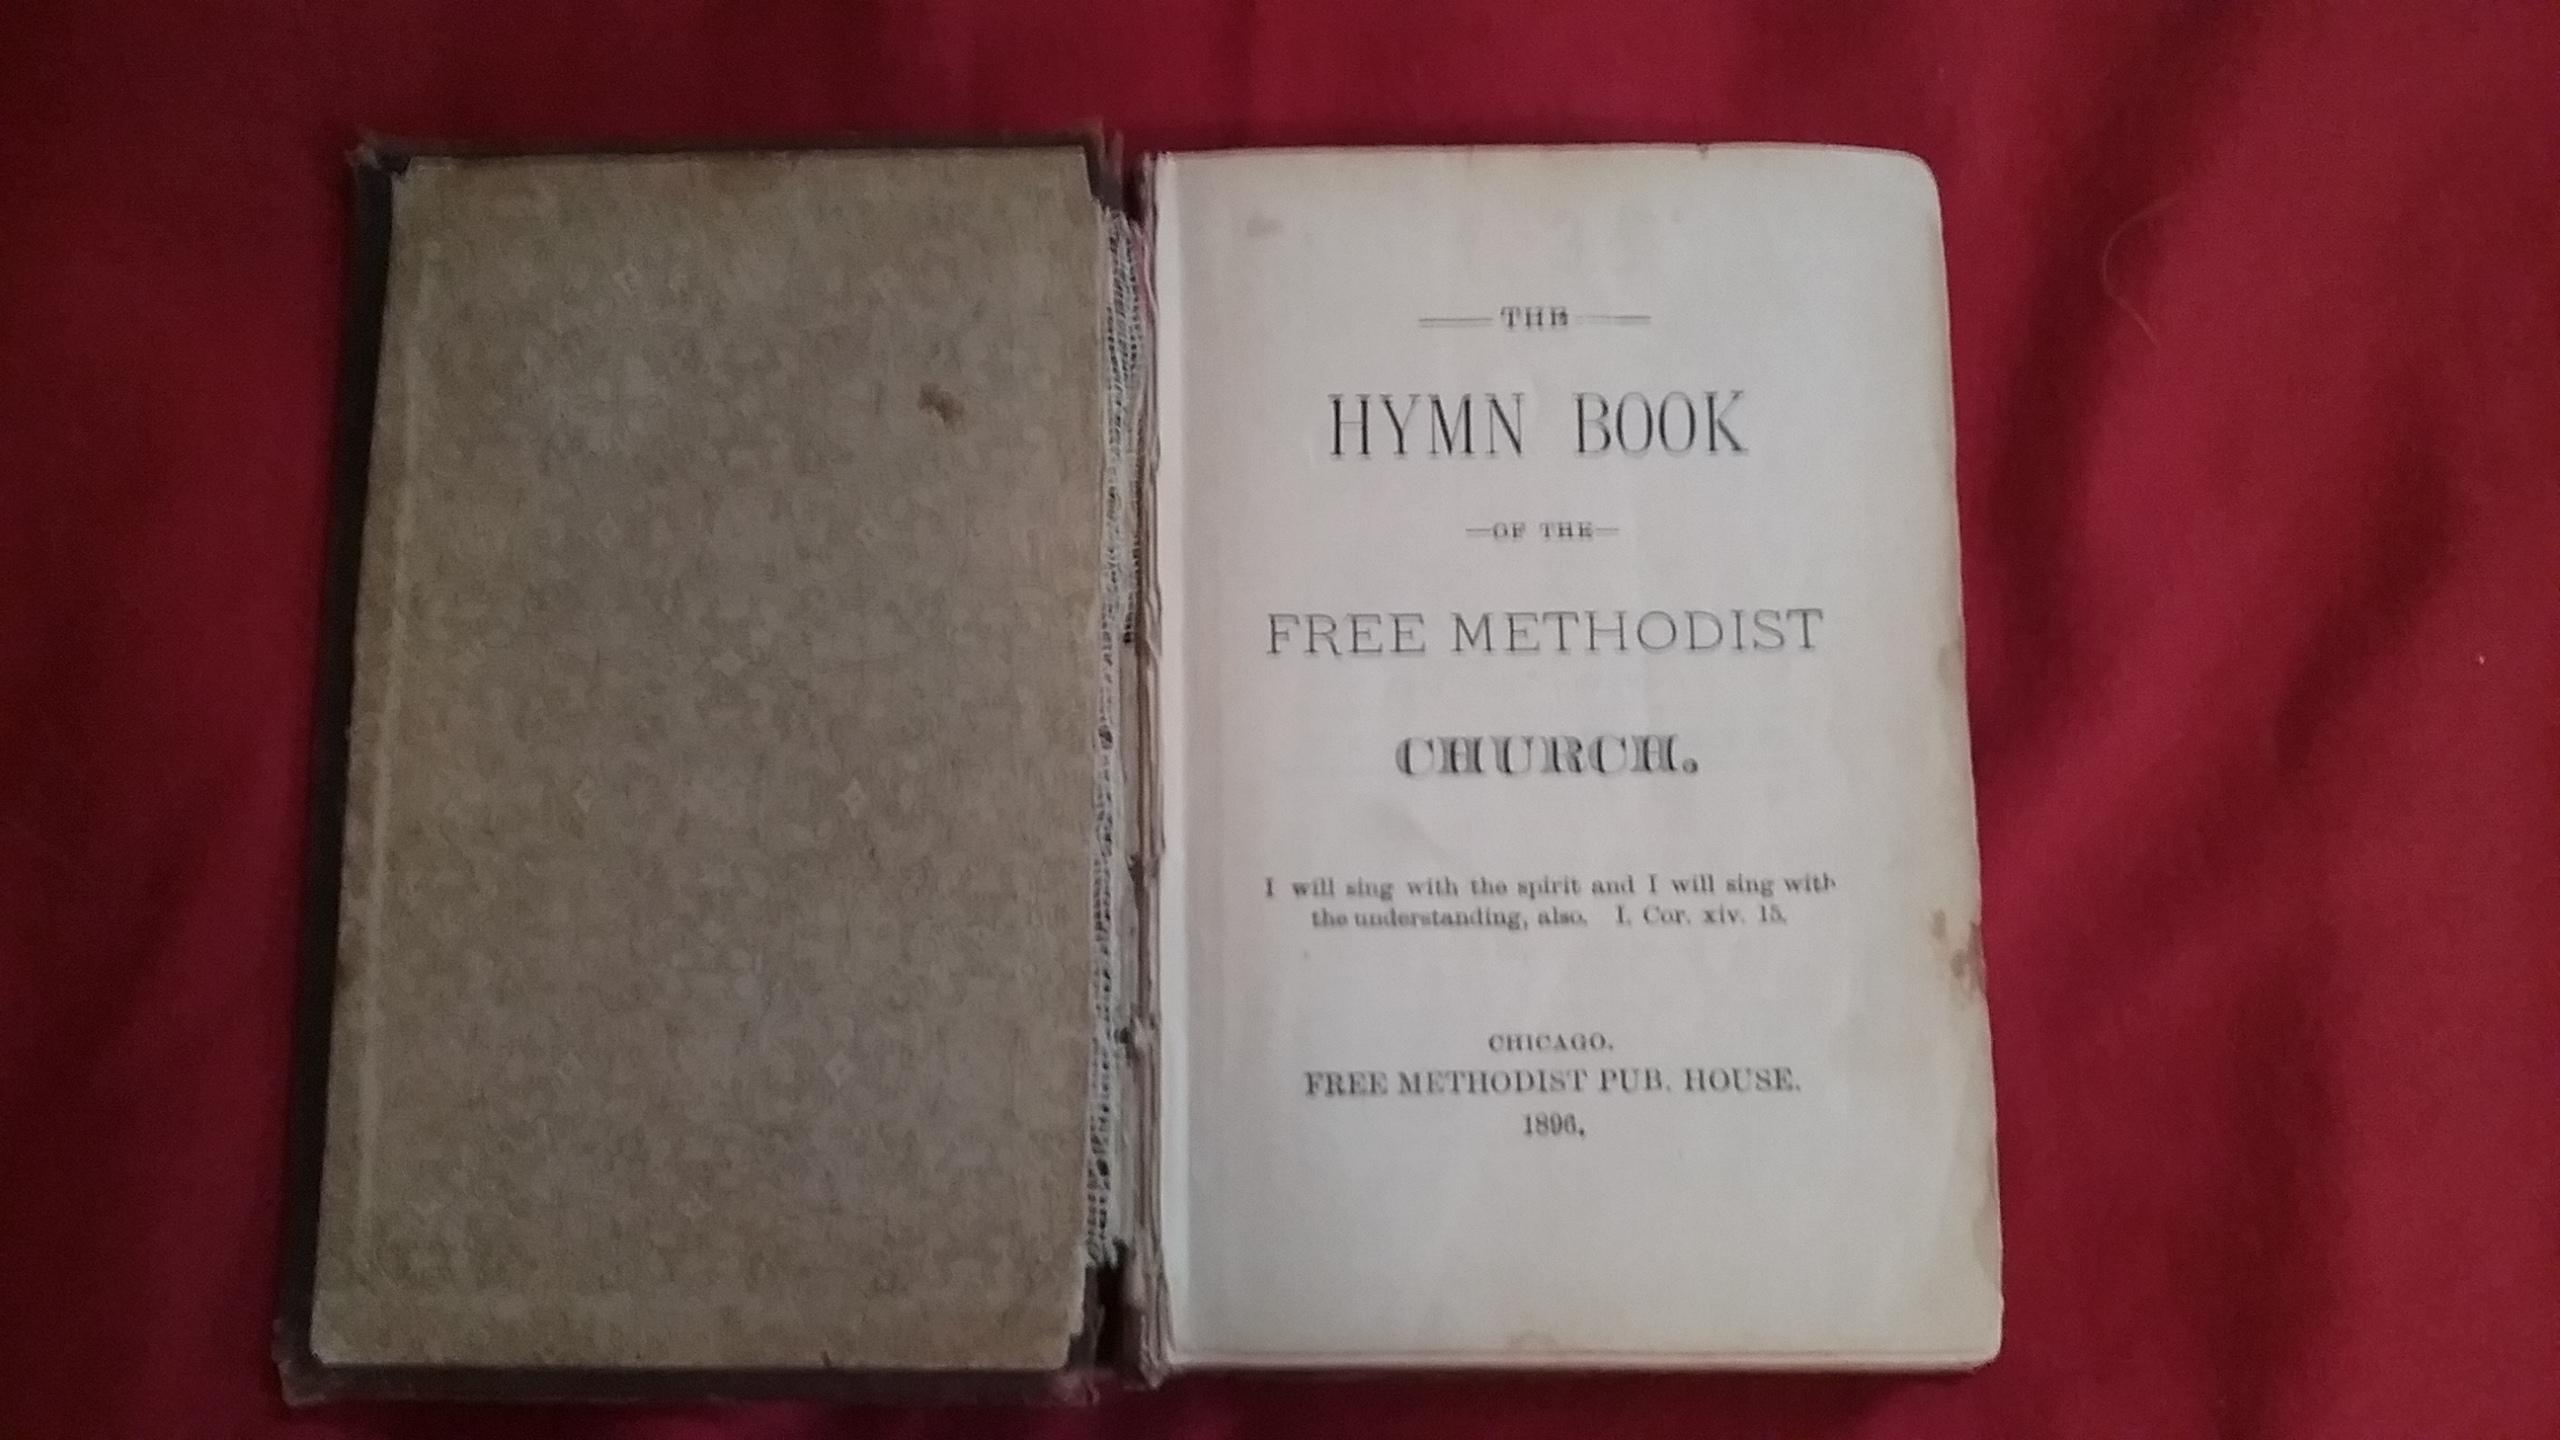 The Methodist Hymn Book